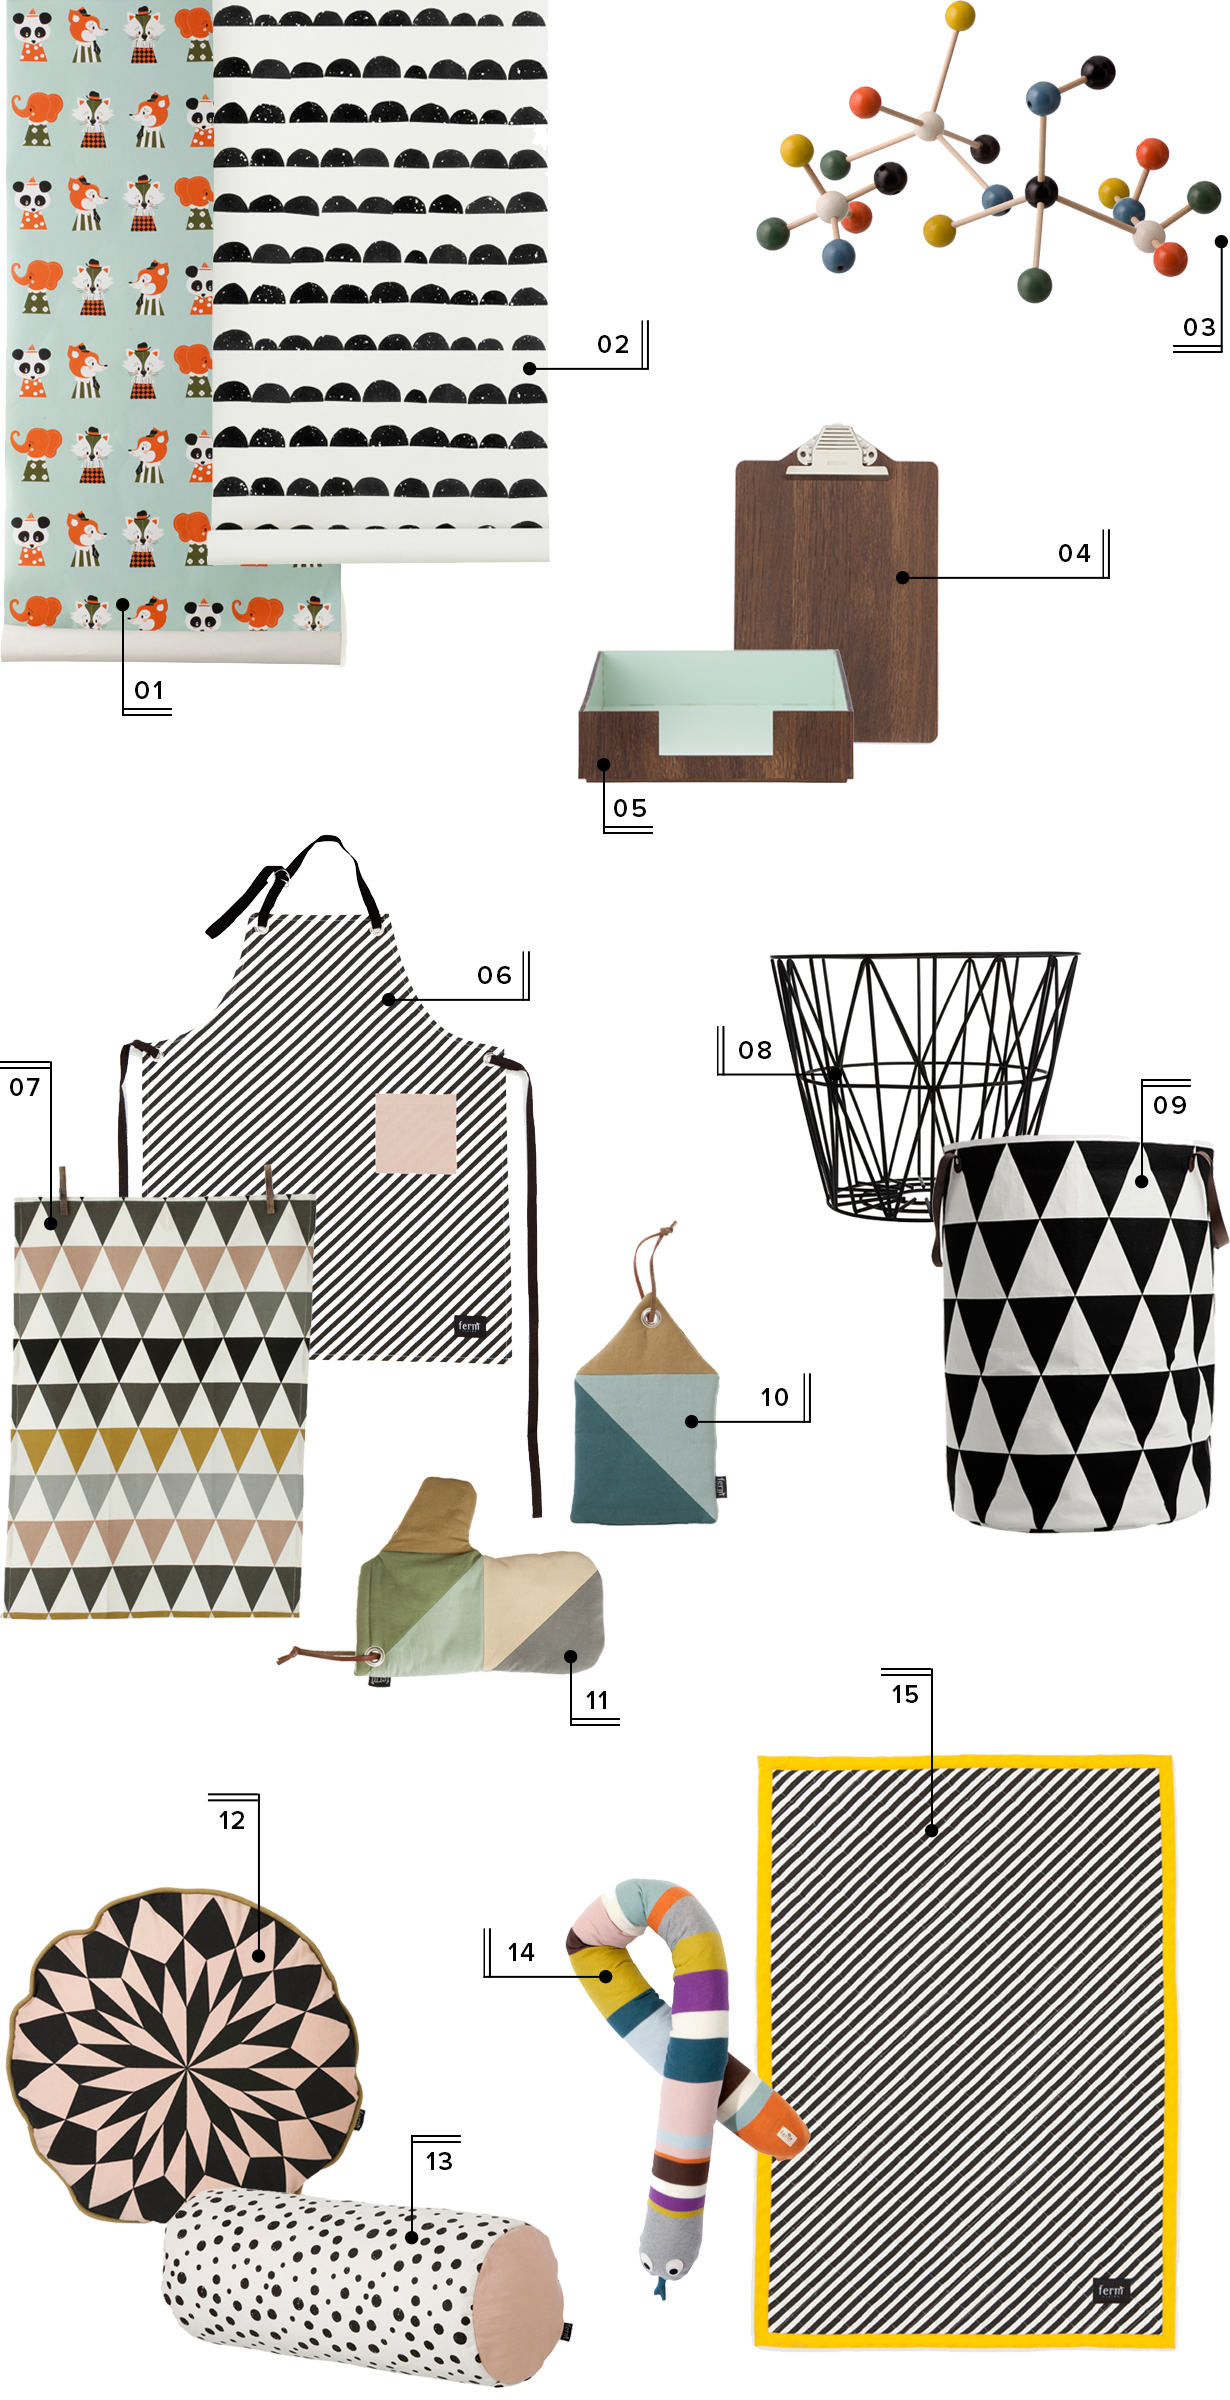 ferm living 2013 round-up on mstetson design